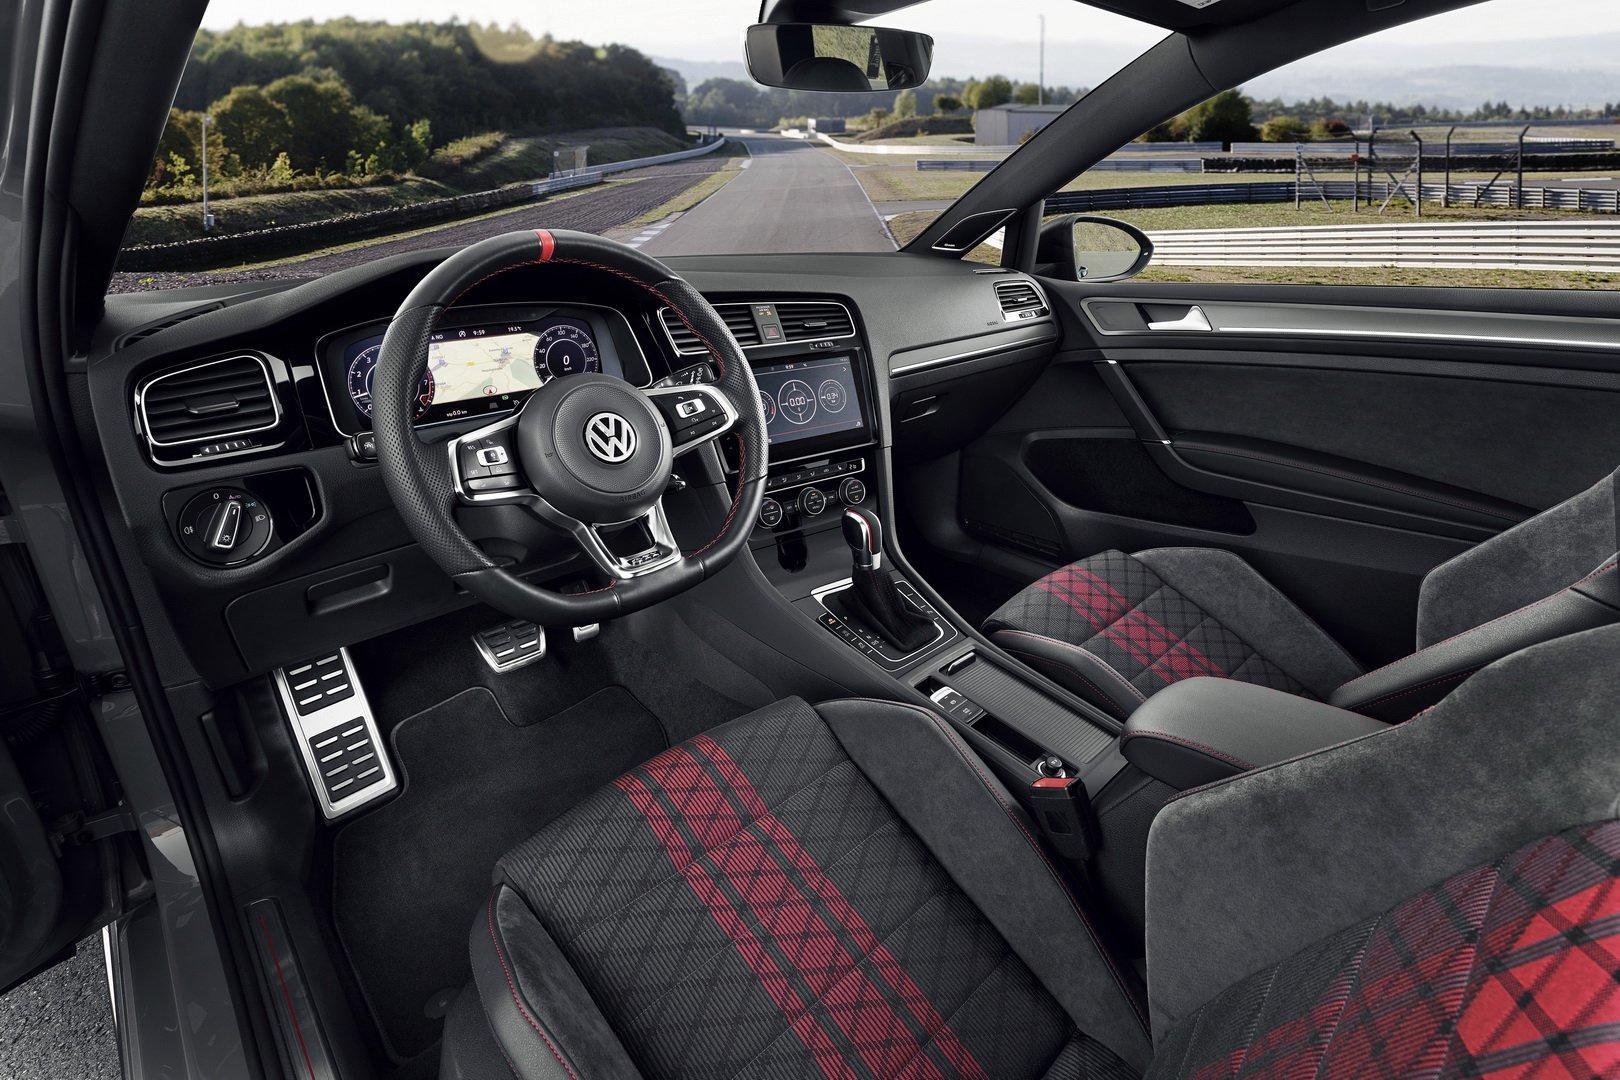 Volkswagen Golf GTI TCR - Volkswagen Golf GTI TCR